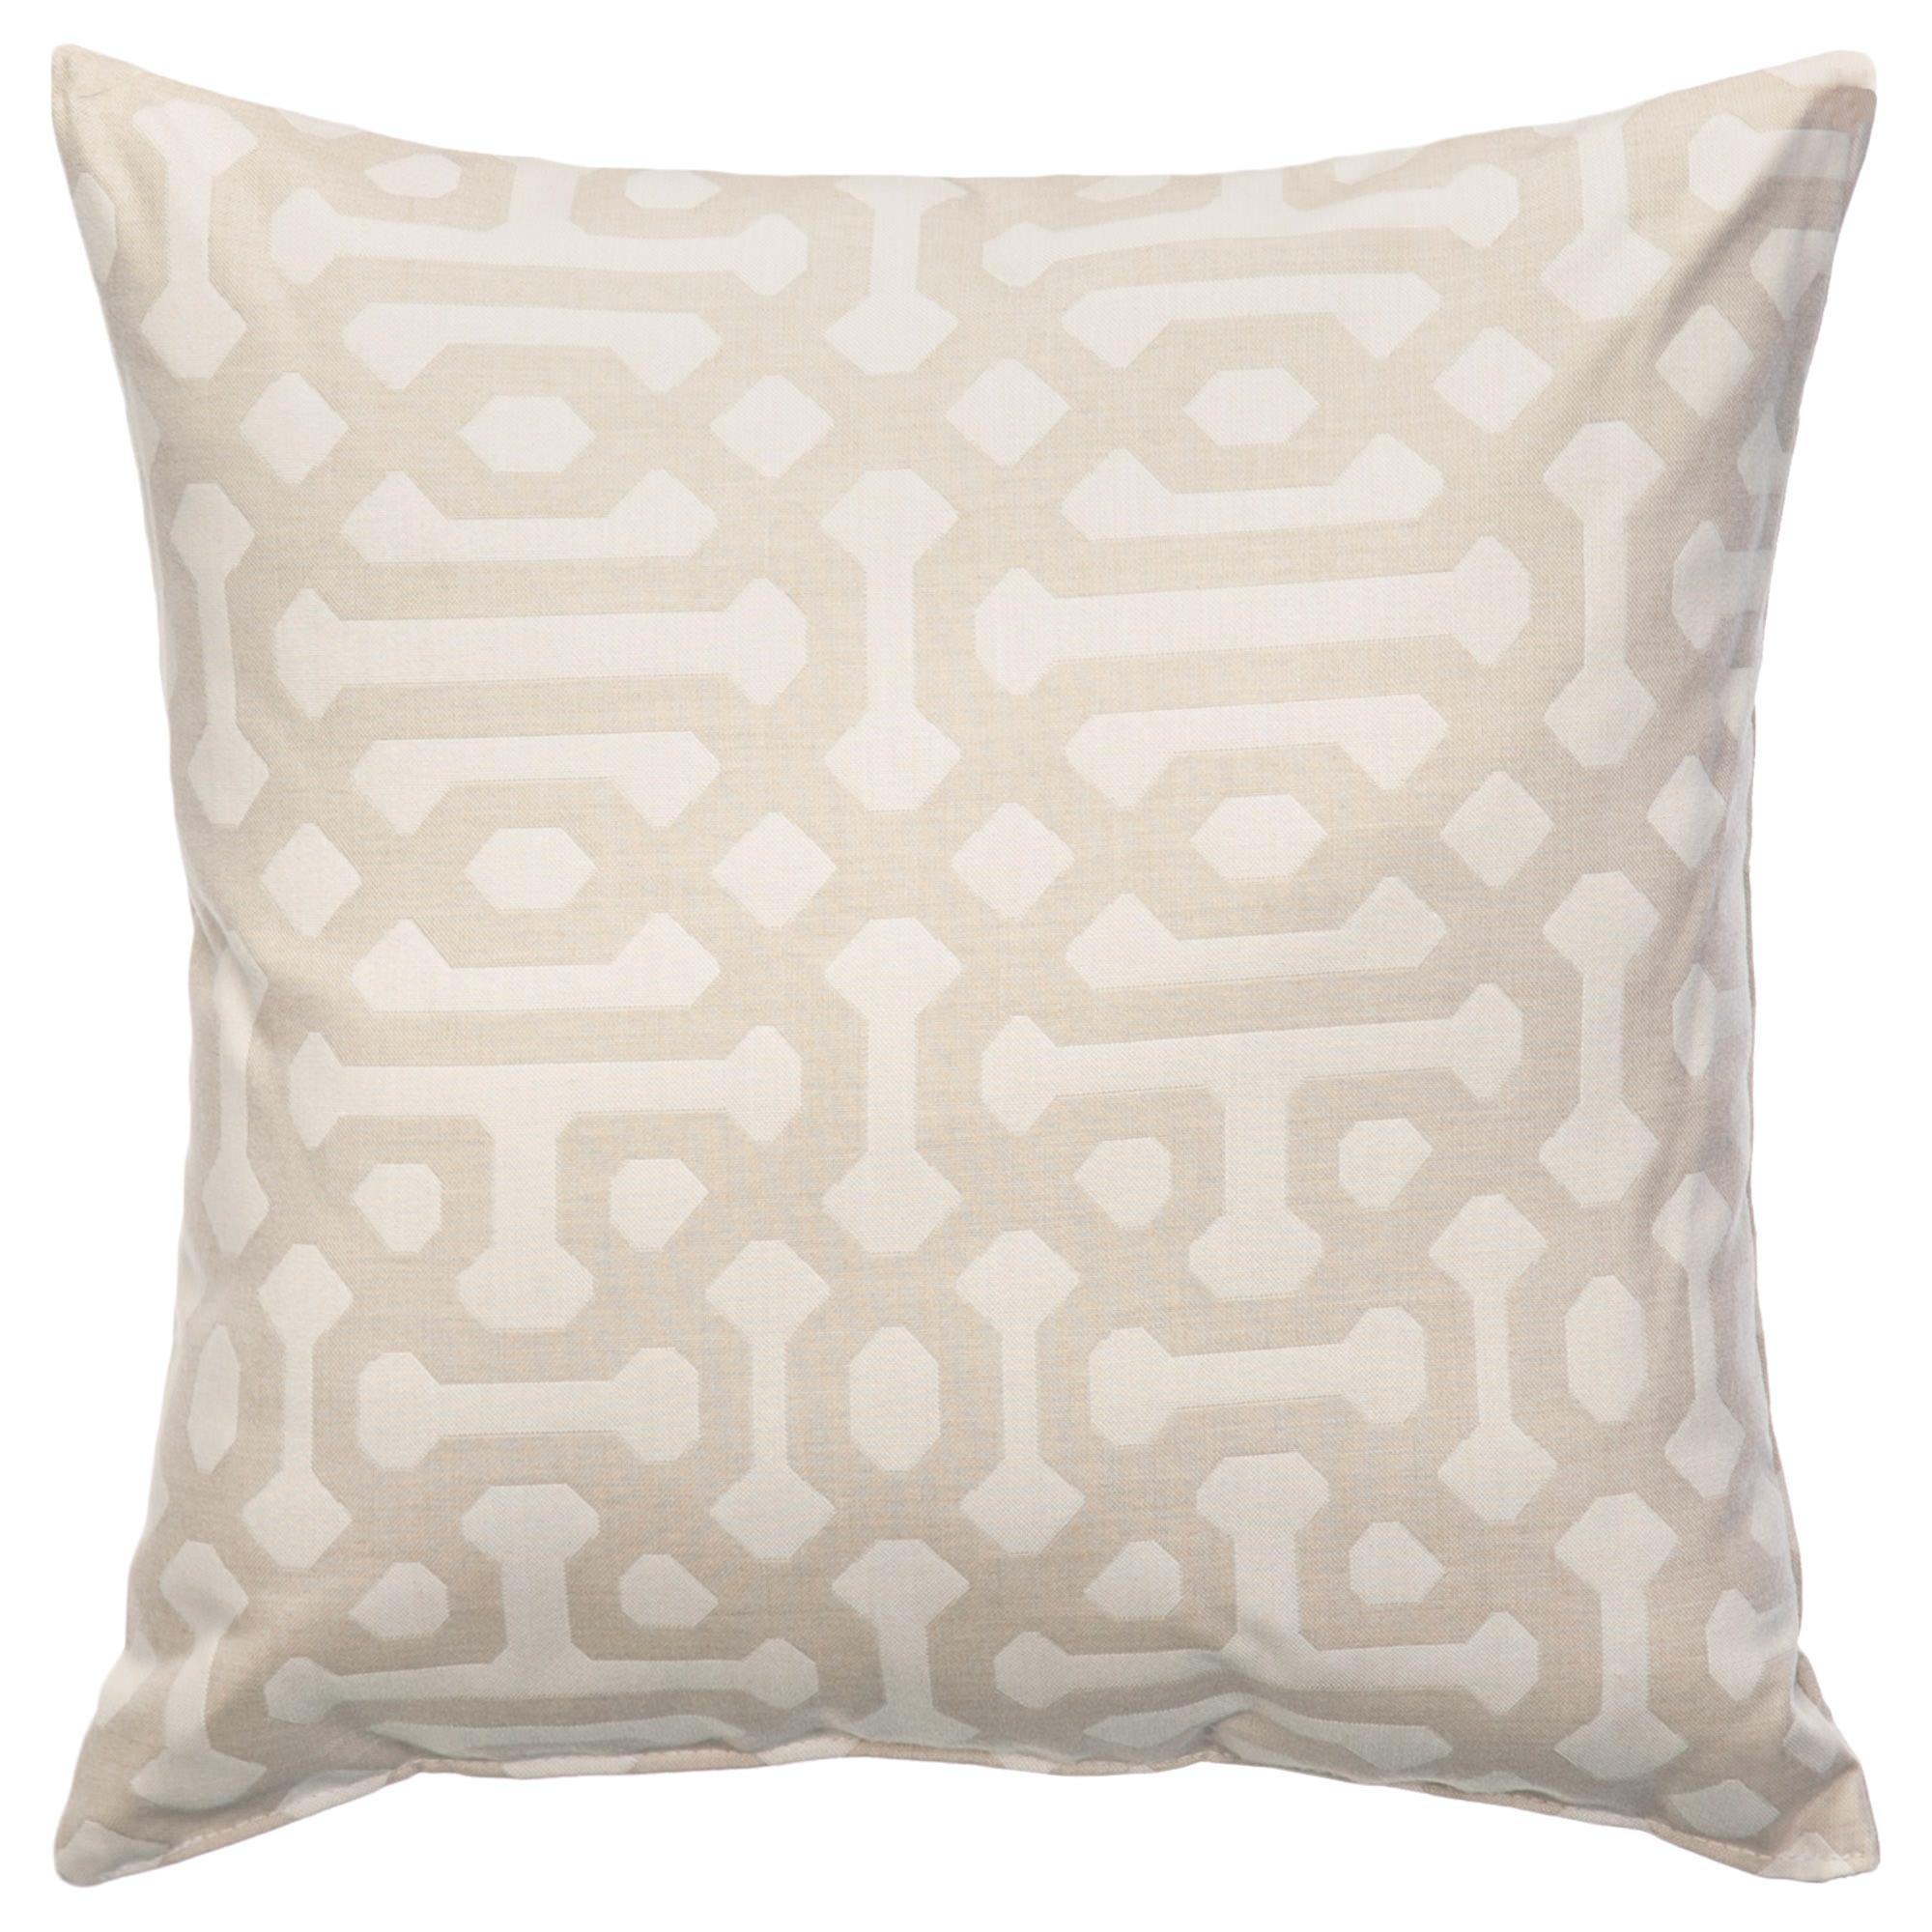 Fretwork Flax Sunbrella Outdoor Throw Pillows on Sale